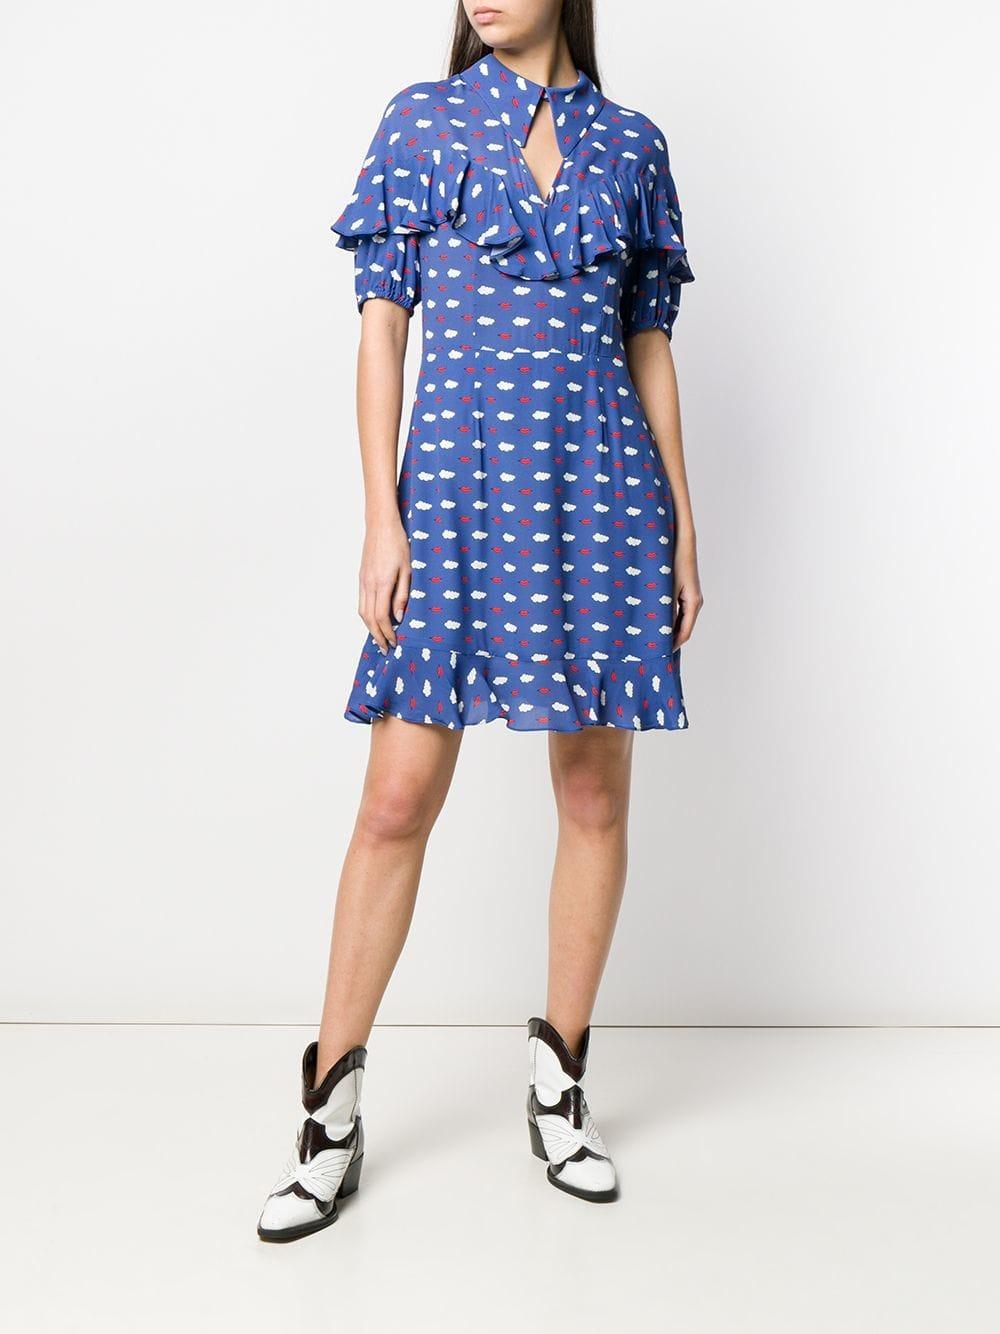 27696bdaa2f Vivetta Clouds And Lips Print Ruffle Dress in Blue - Lyst